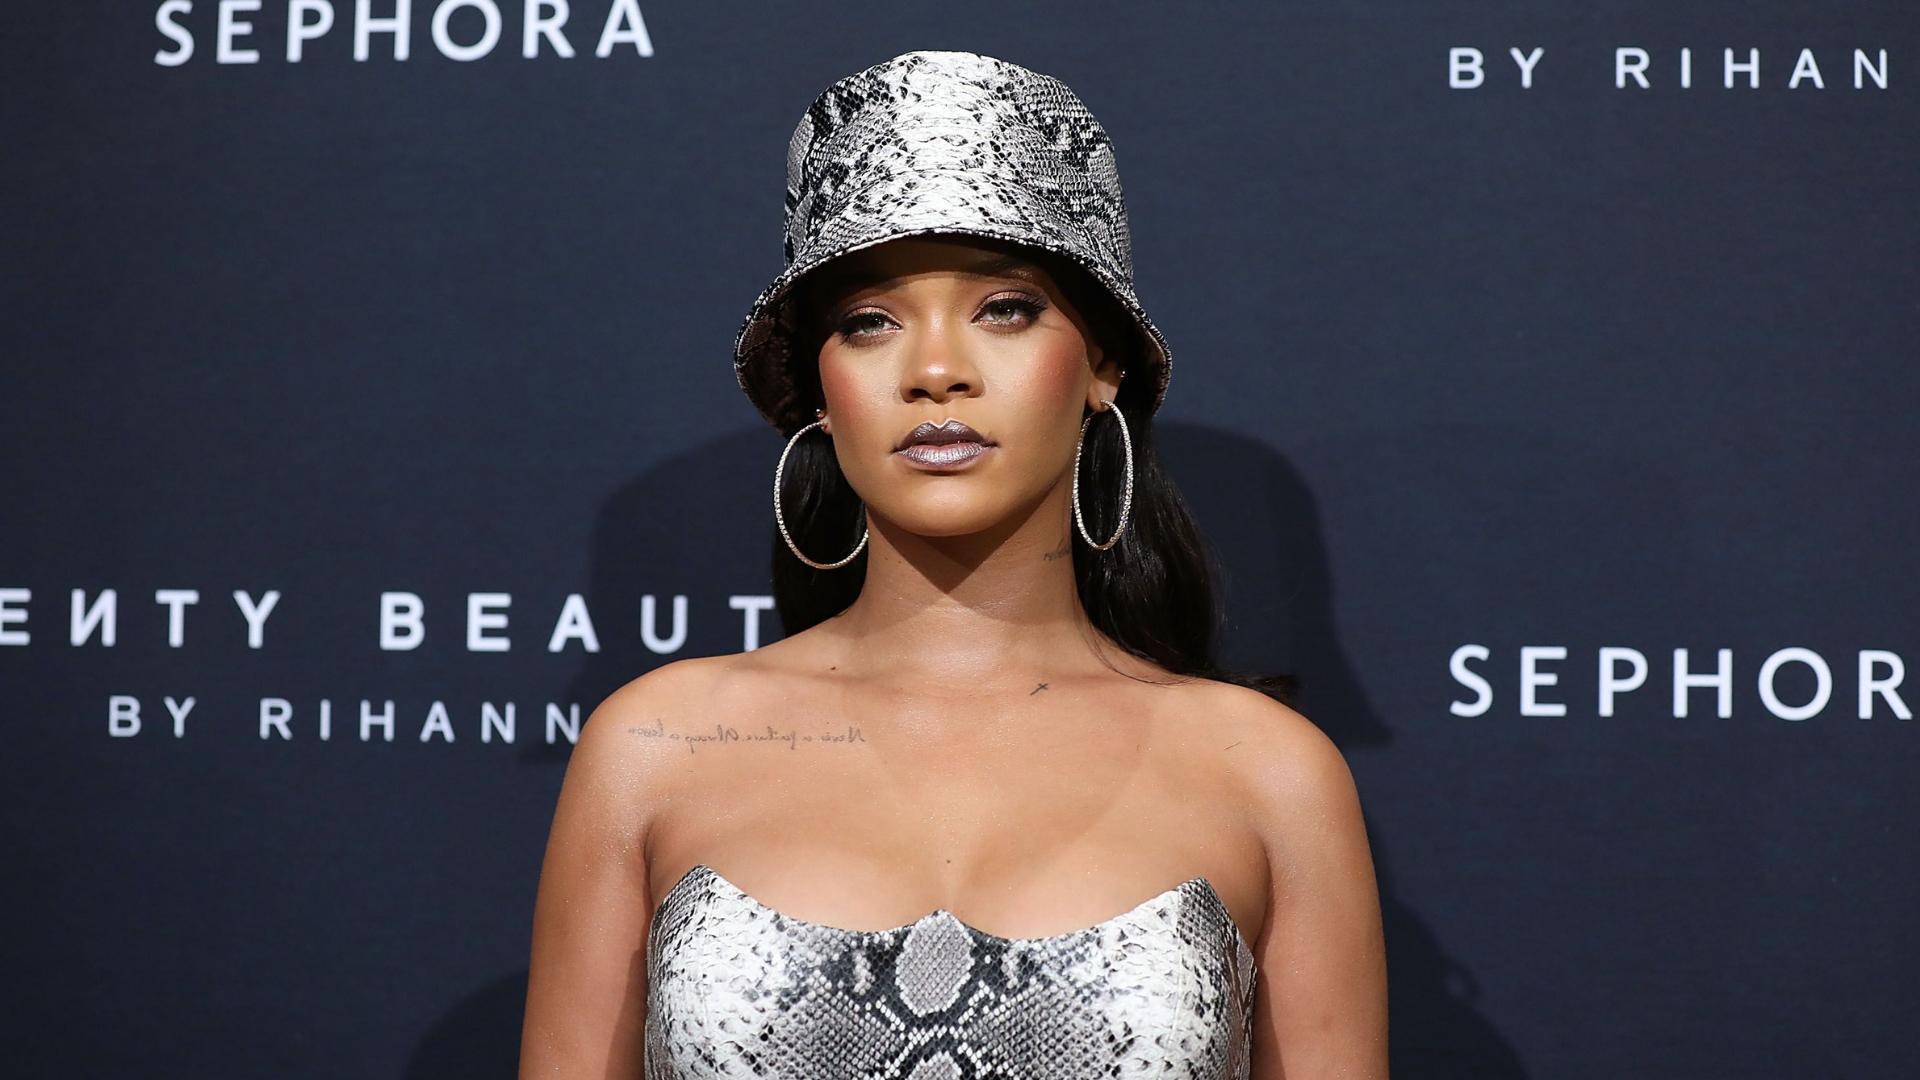 Rihanna's Fenty Fashion Label Launches In Paris Tomorrow